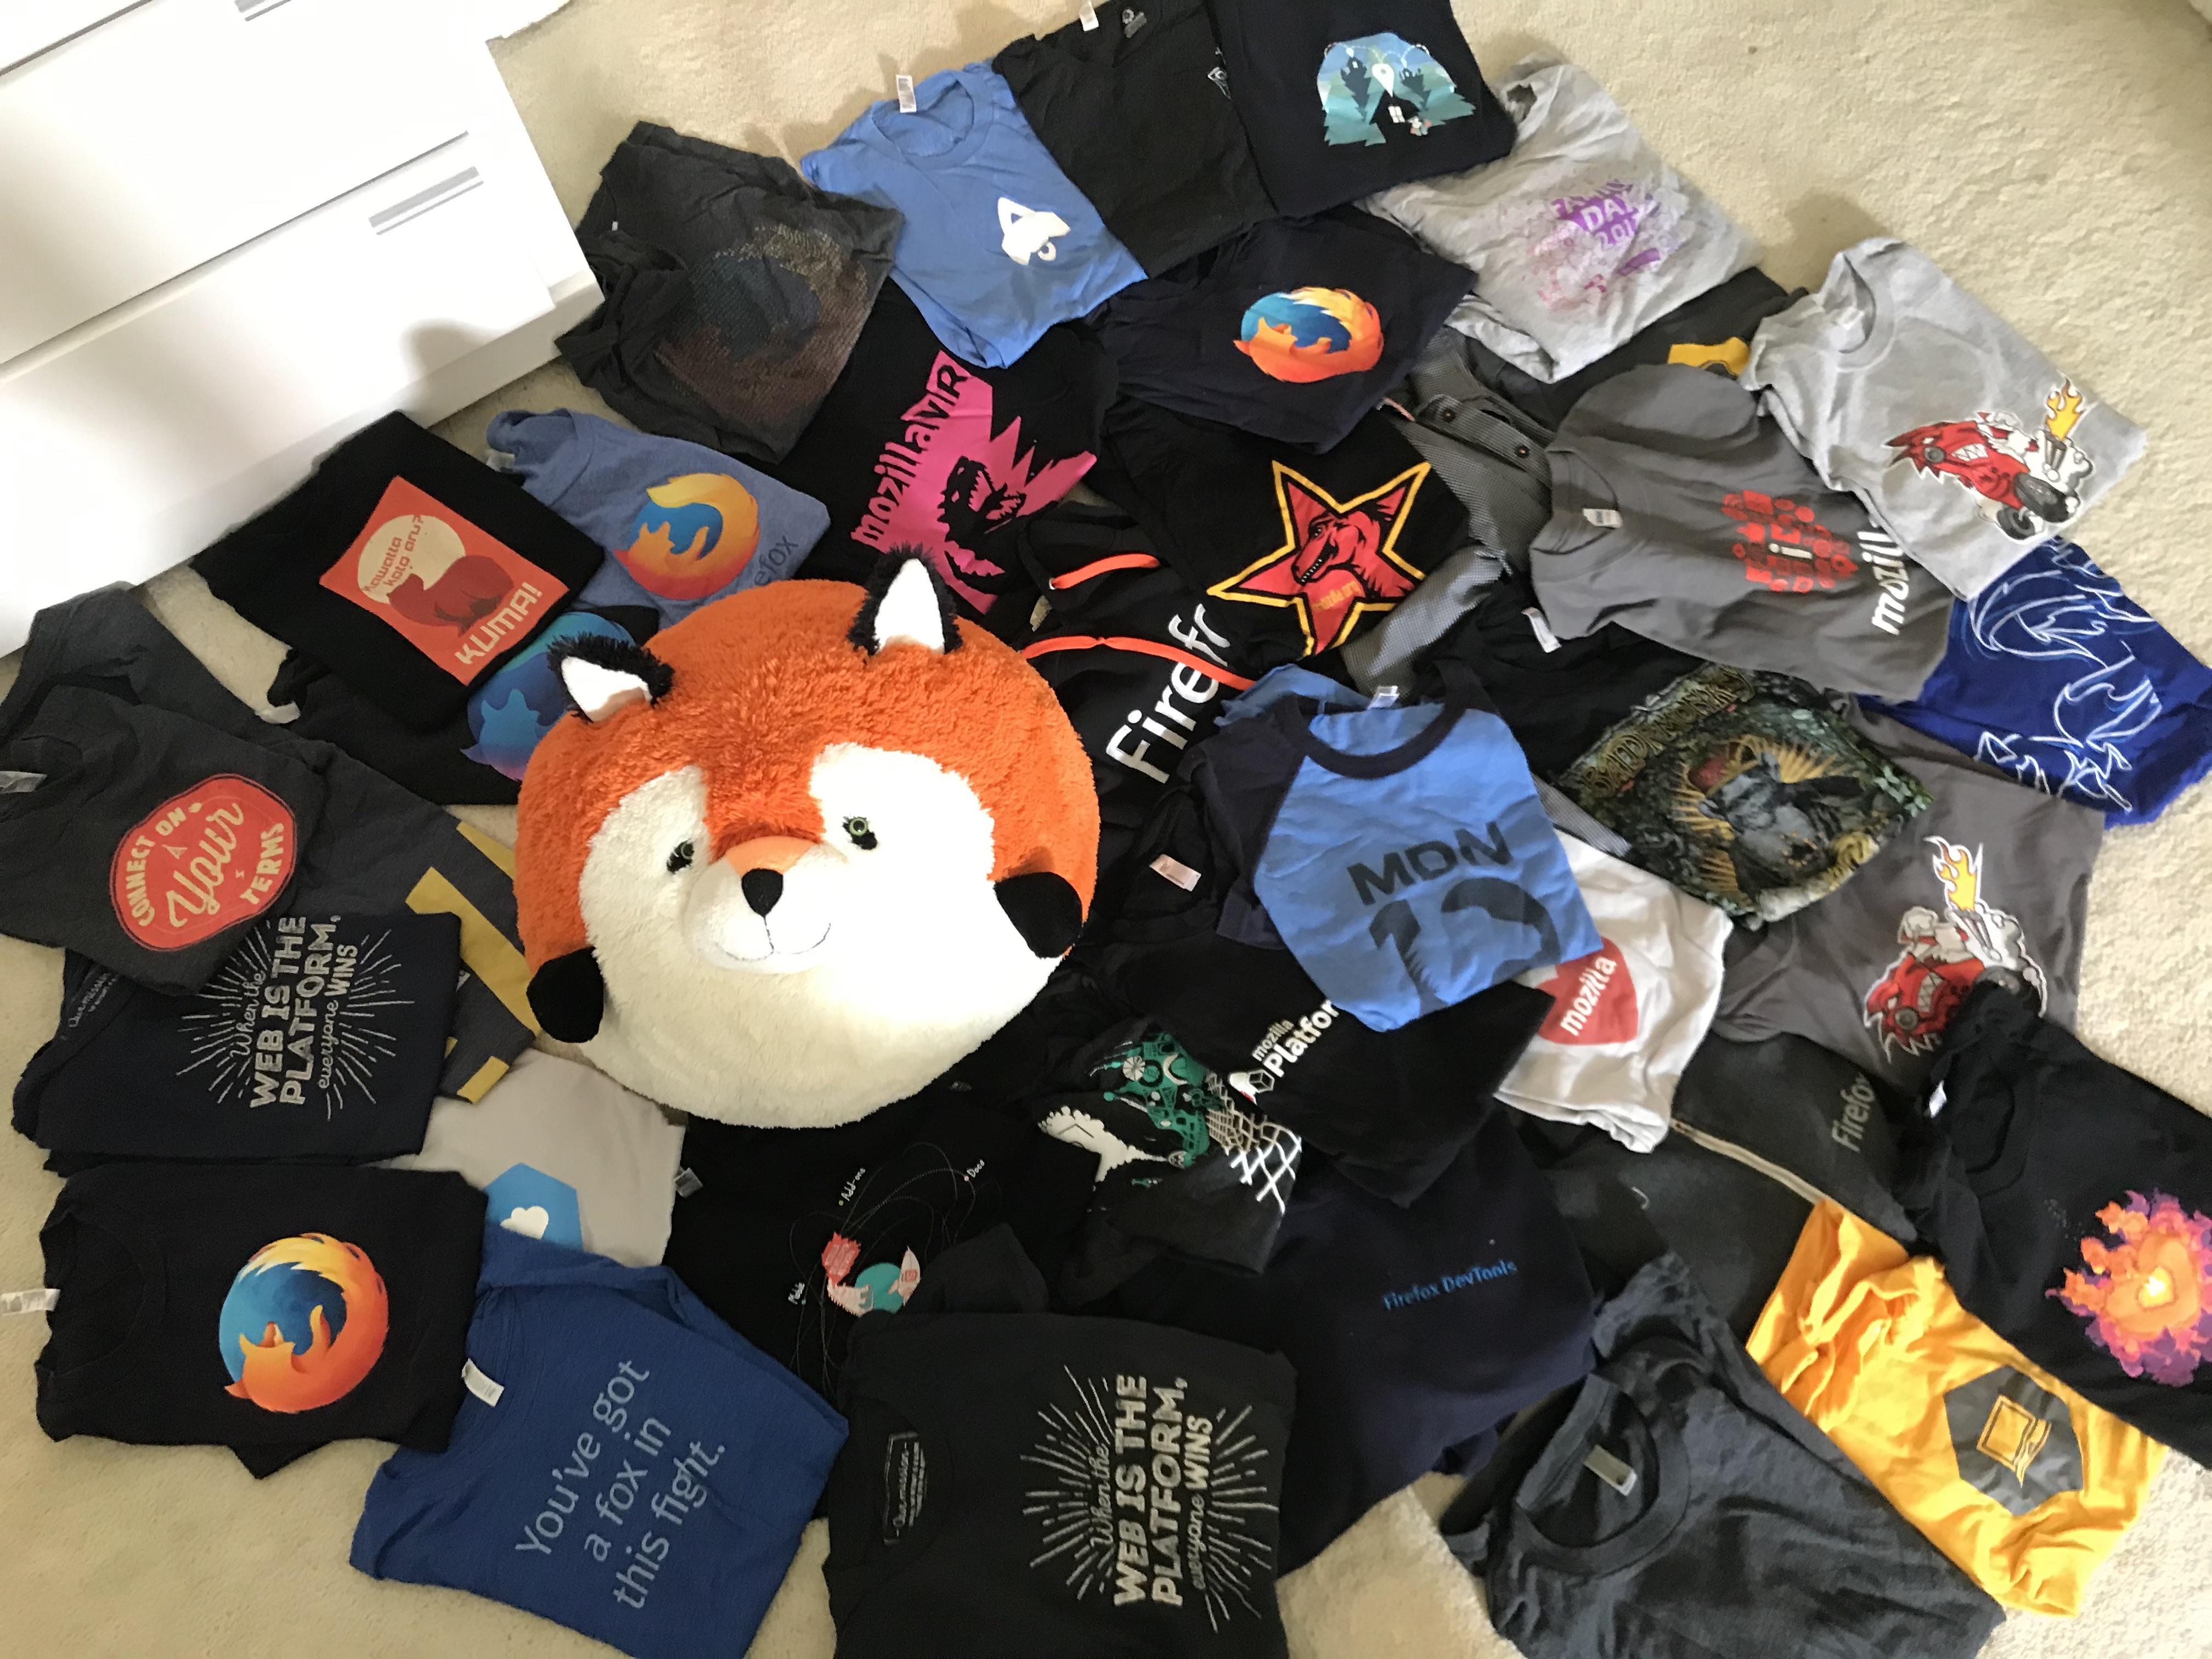 39 Shirts – Leaving Mozilla